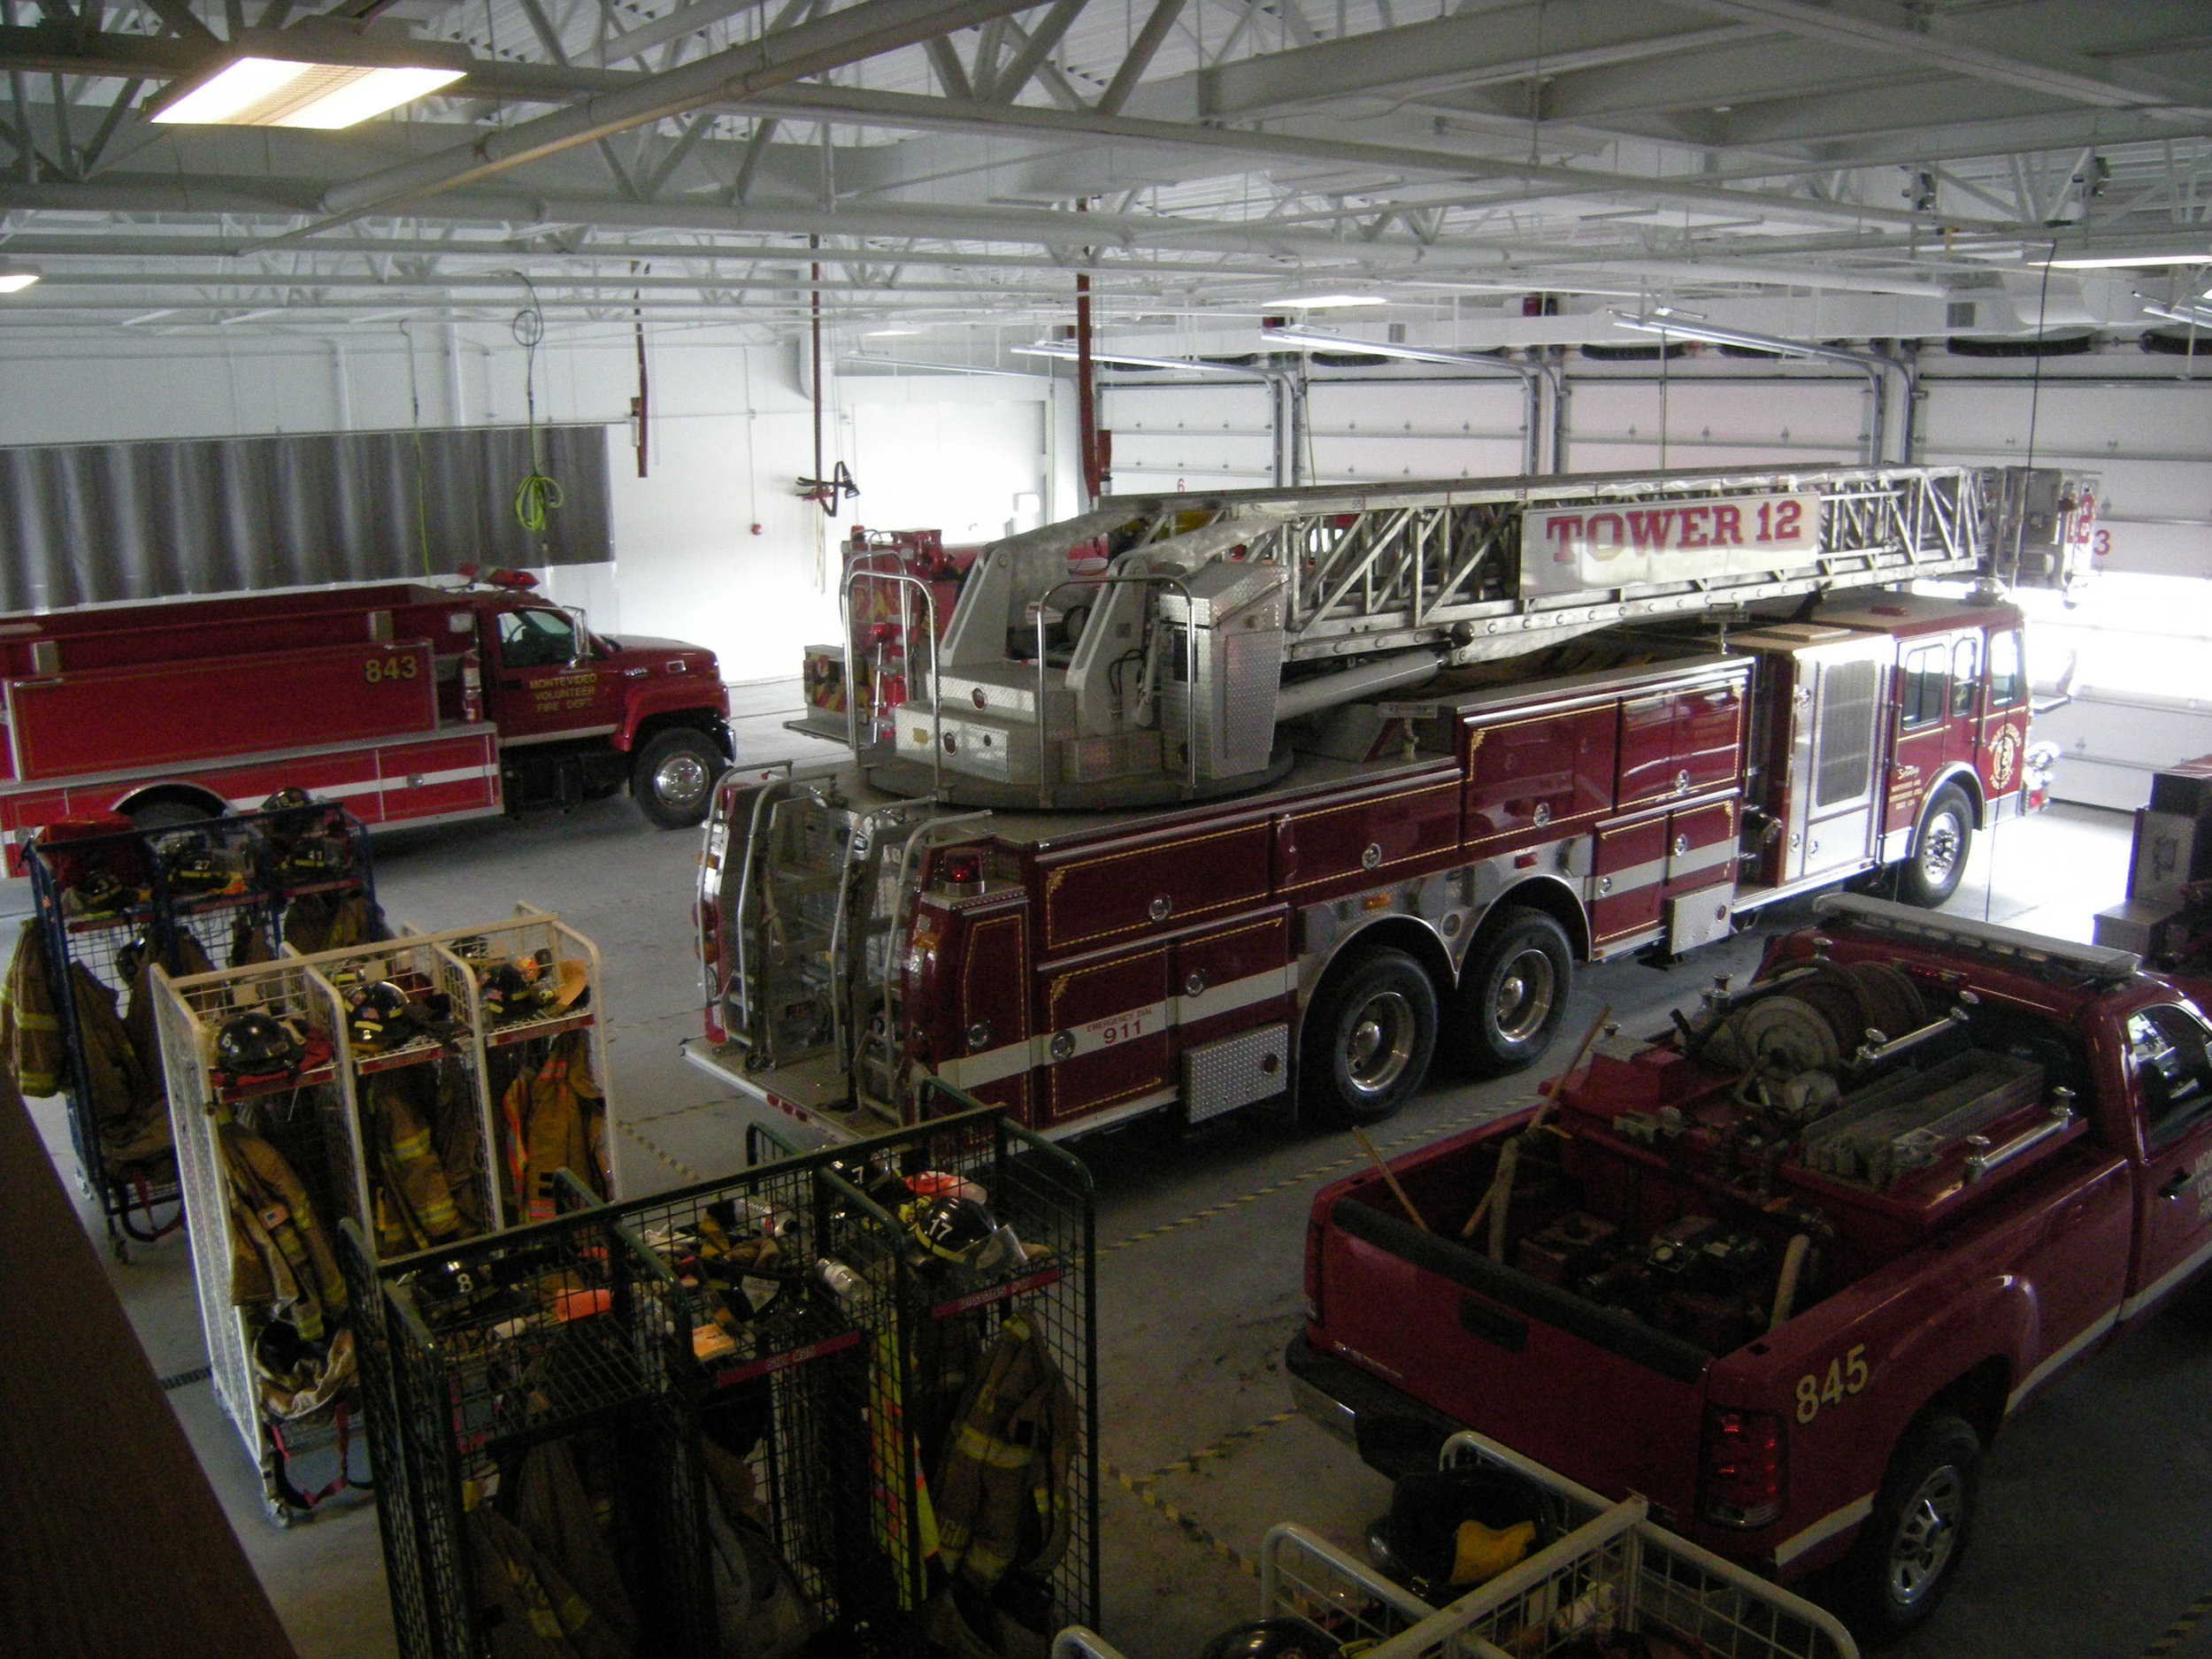 Back side of firetrucks in the garage